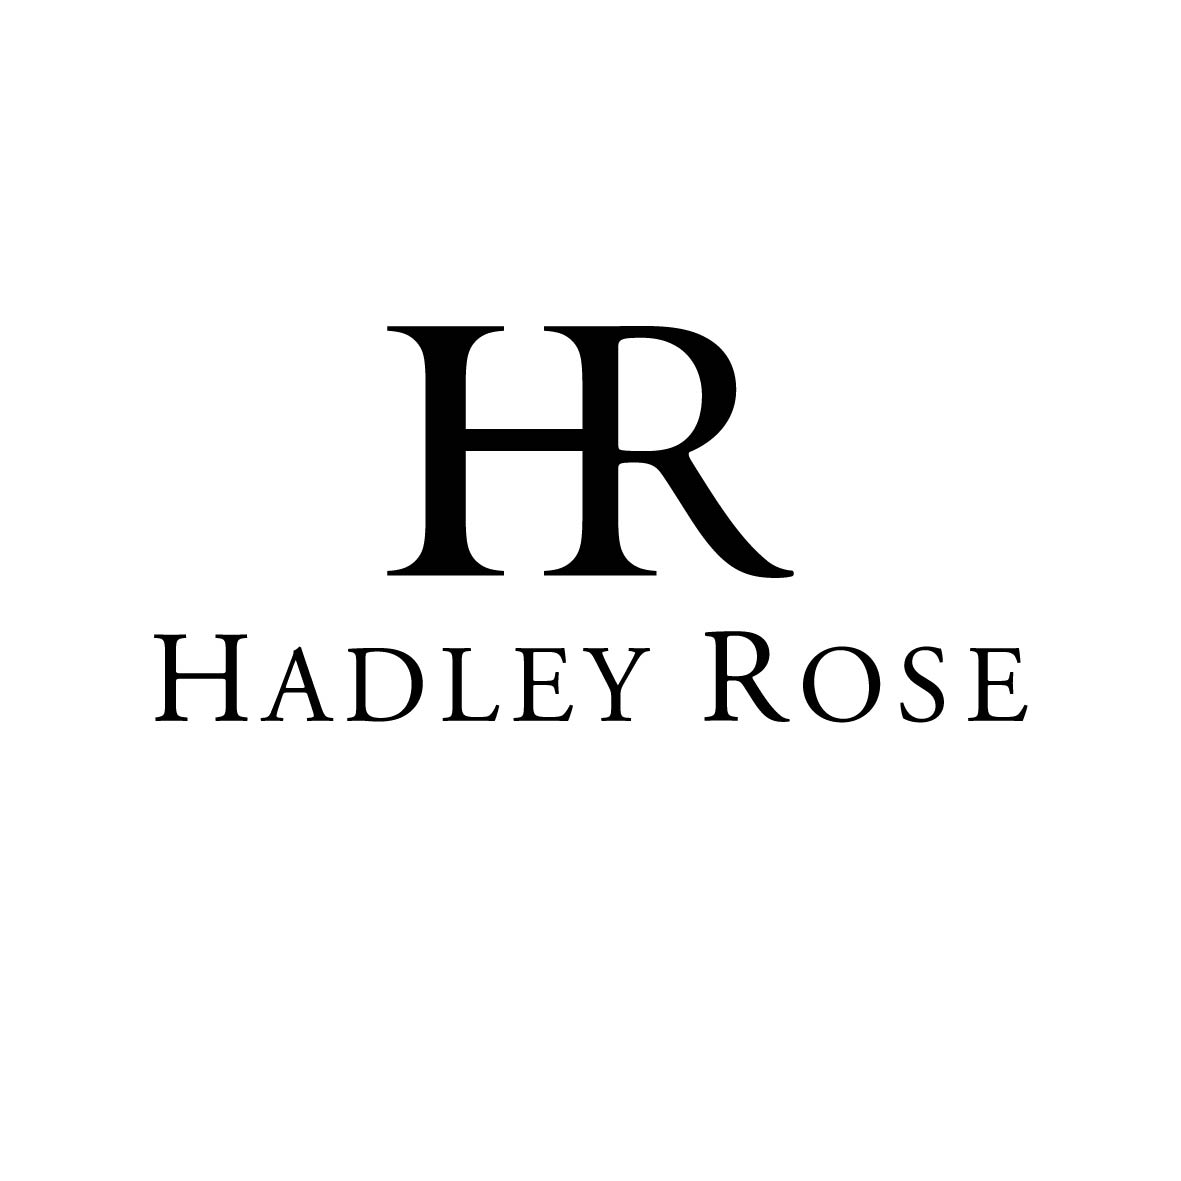 Hadley Rose - London, London W1H 1DP - 020 7856 0167   ShowMeLocal.com